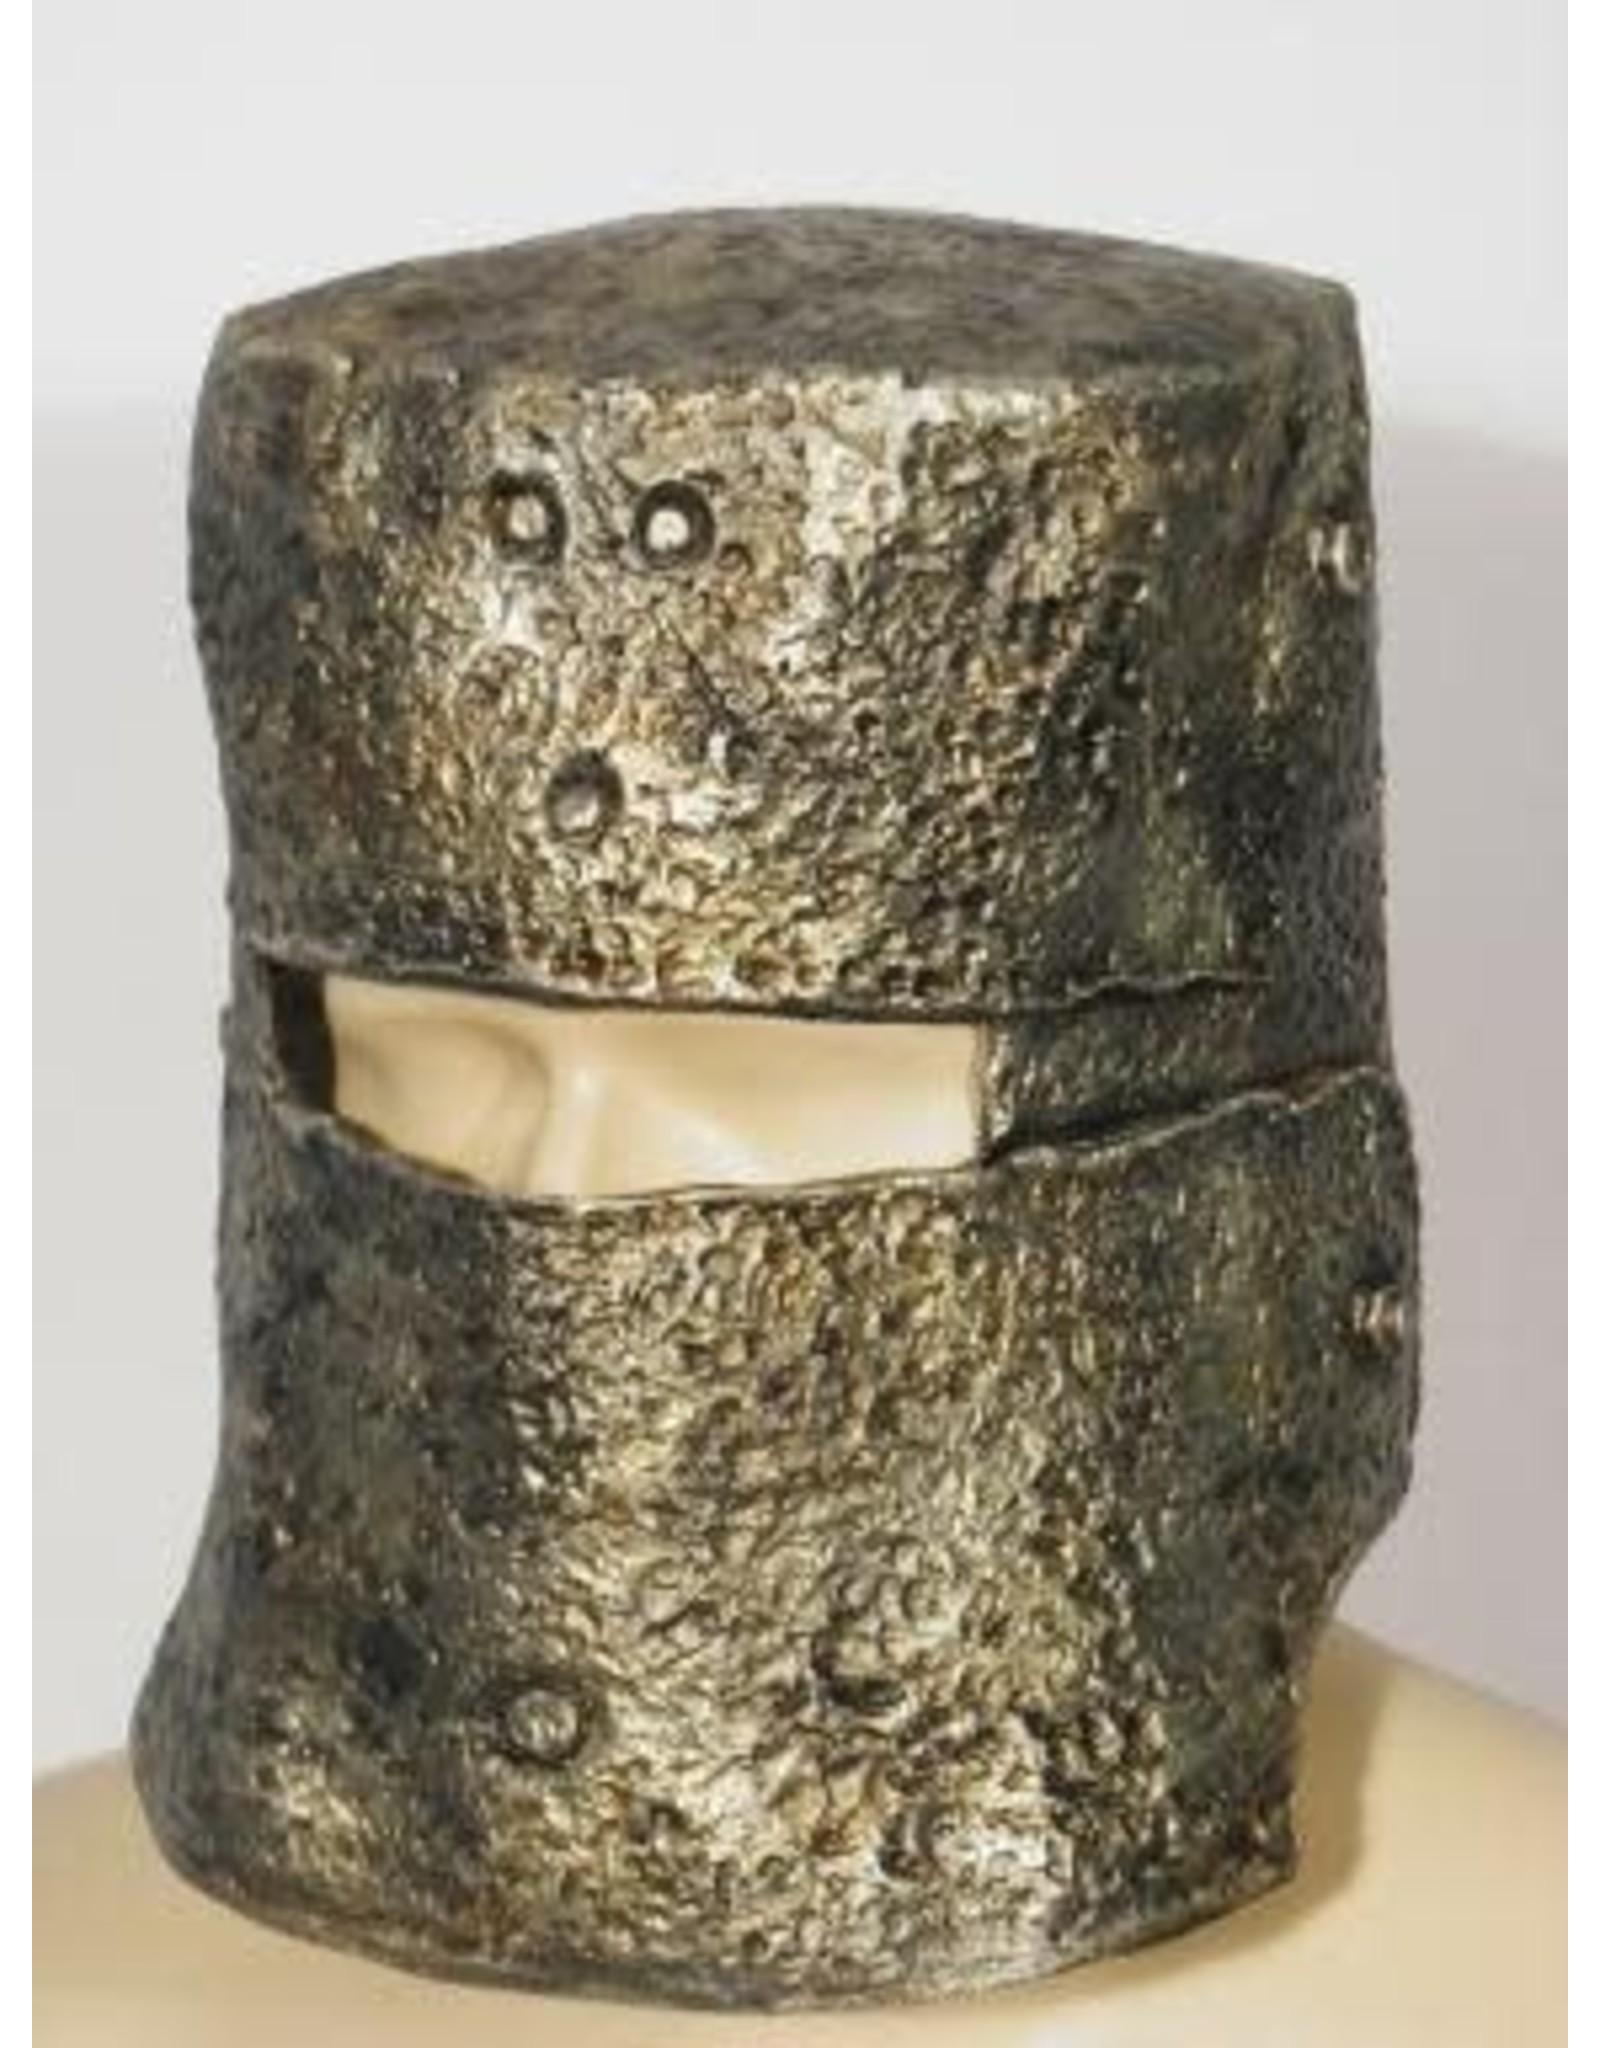 HM Smallwares Medieval Helmet